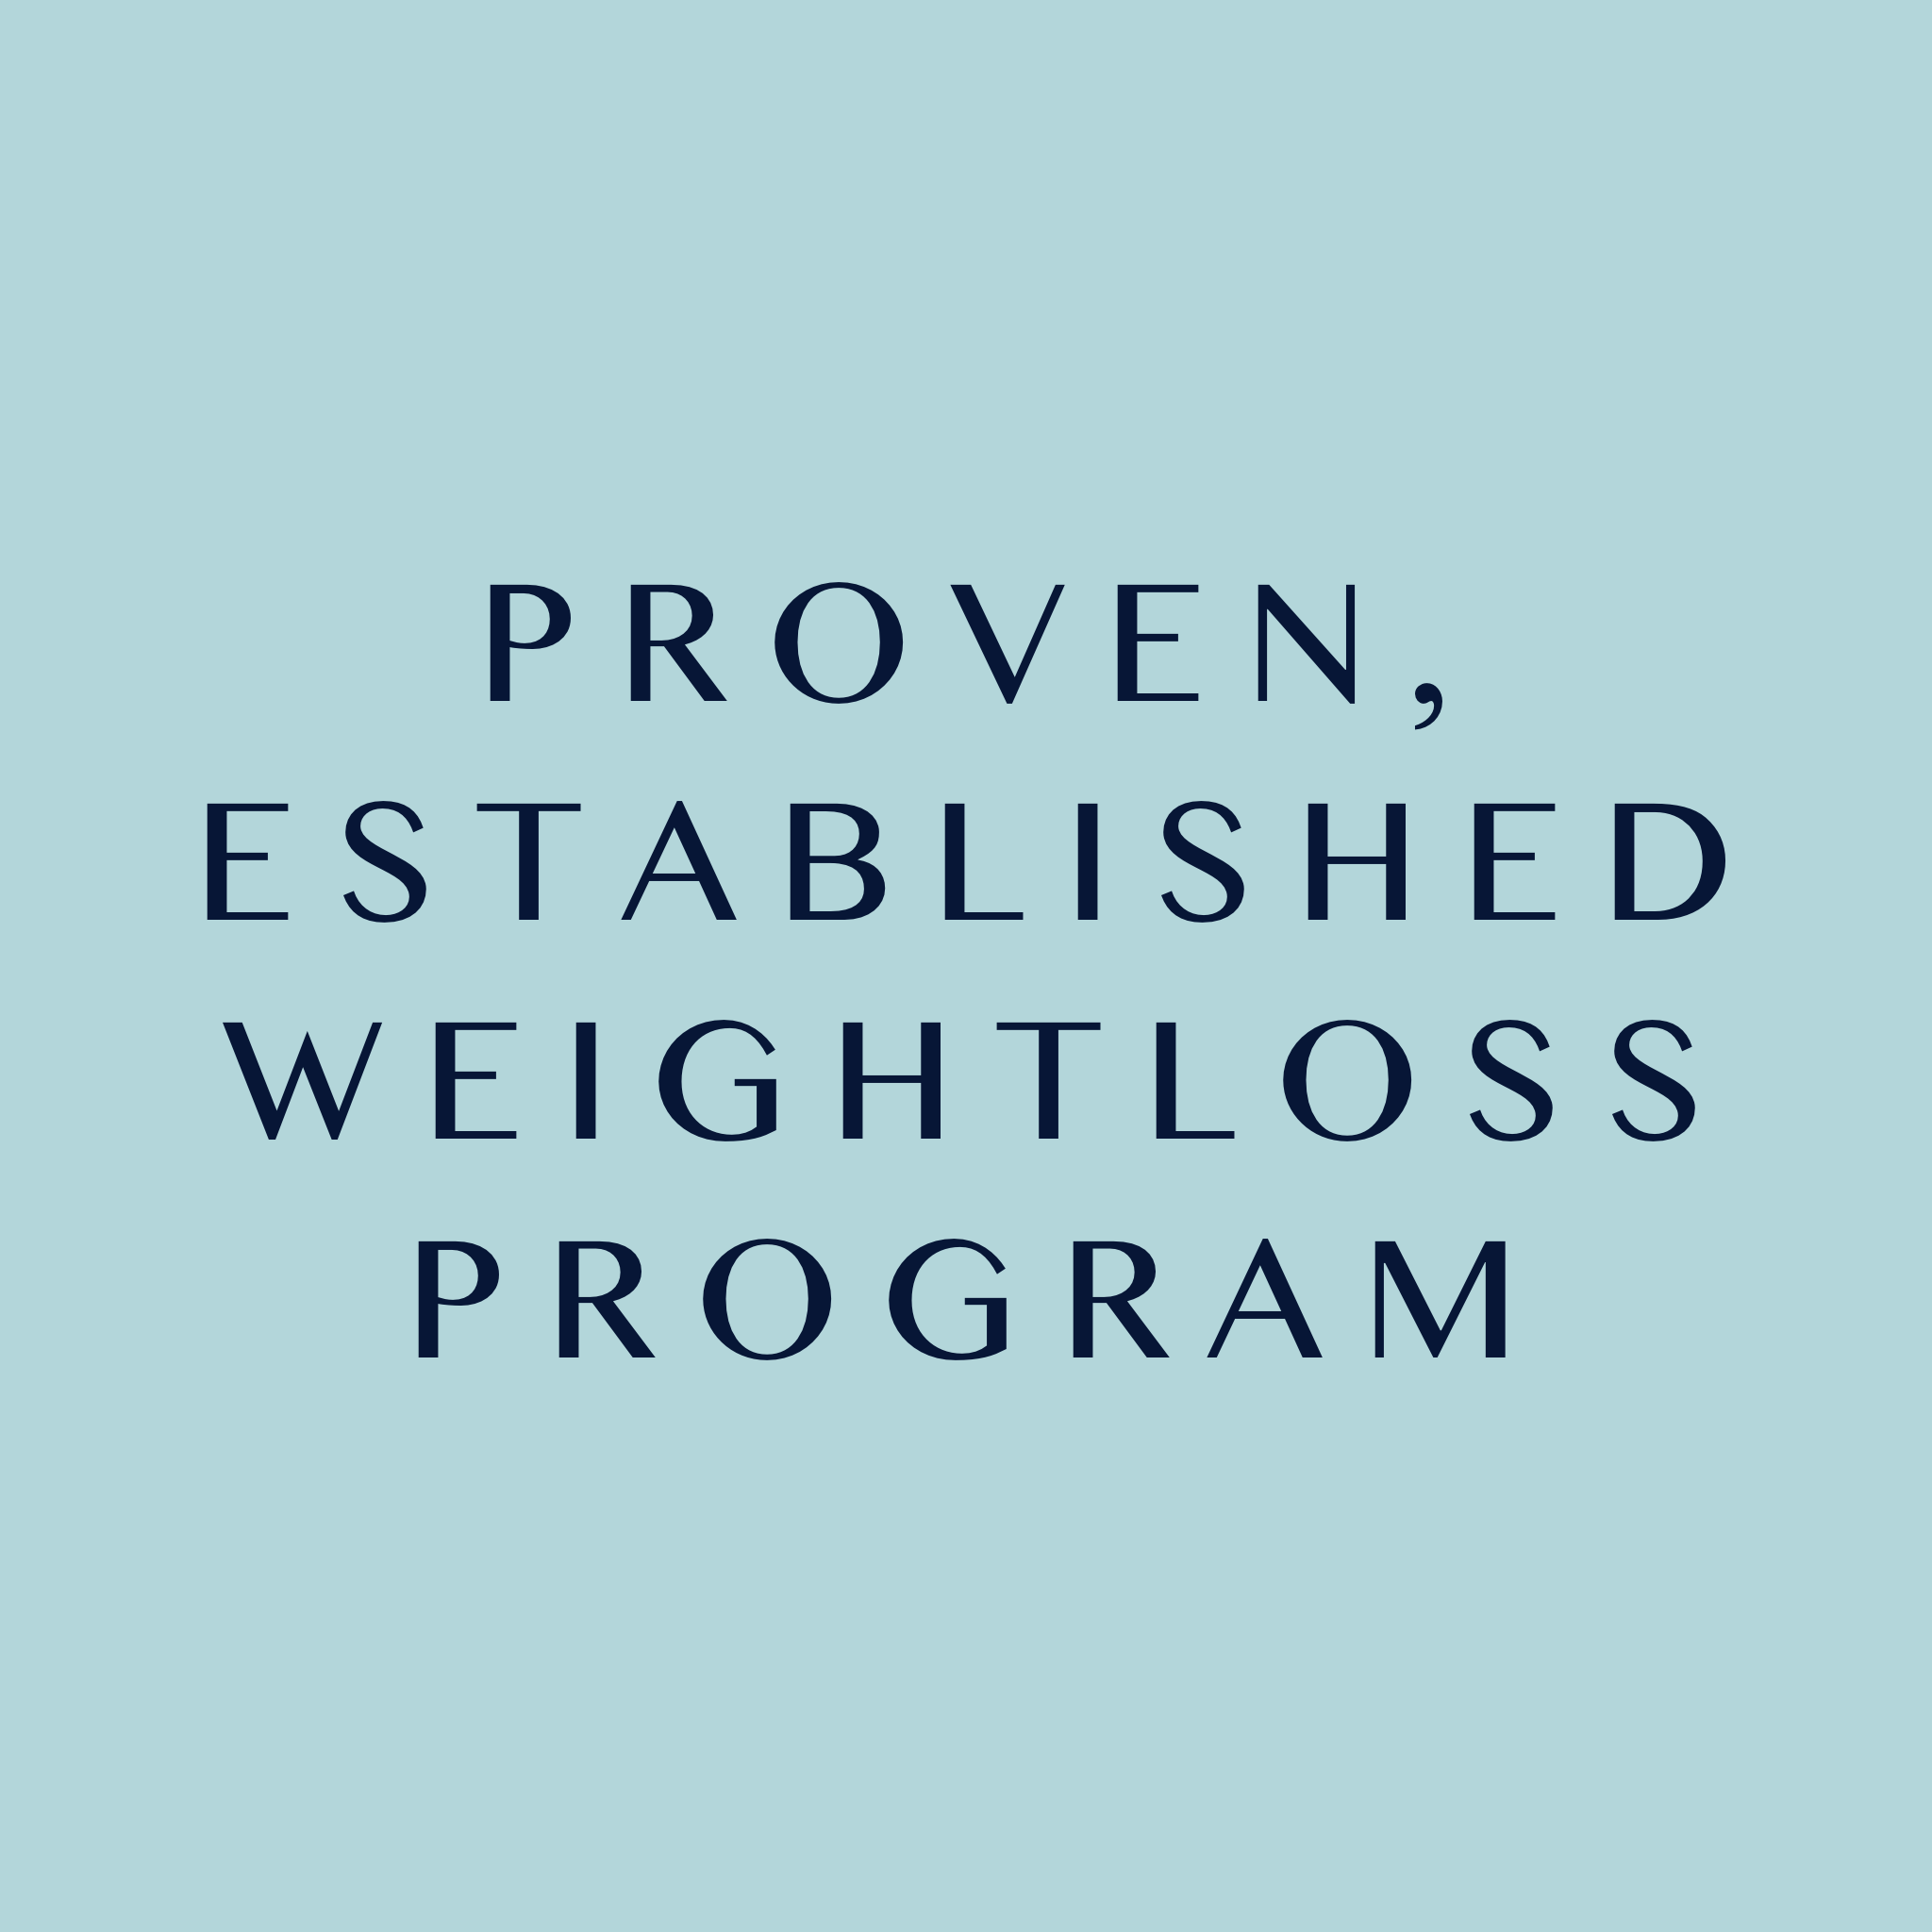 proven established effective weightloss program